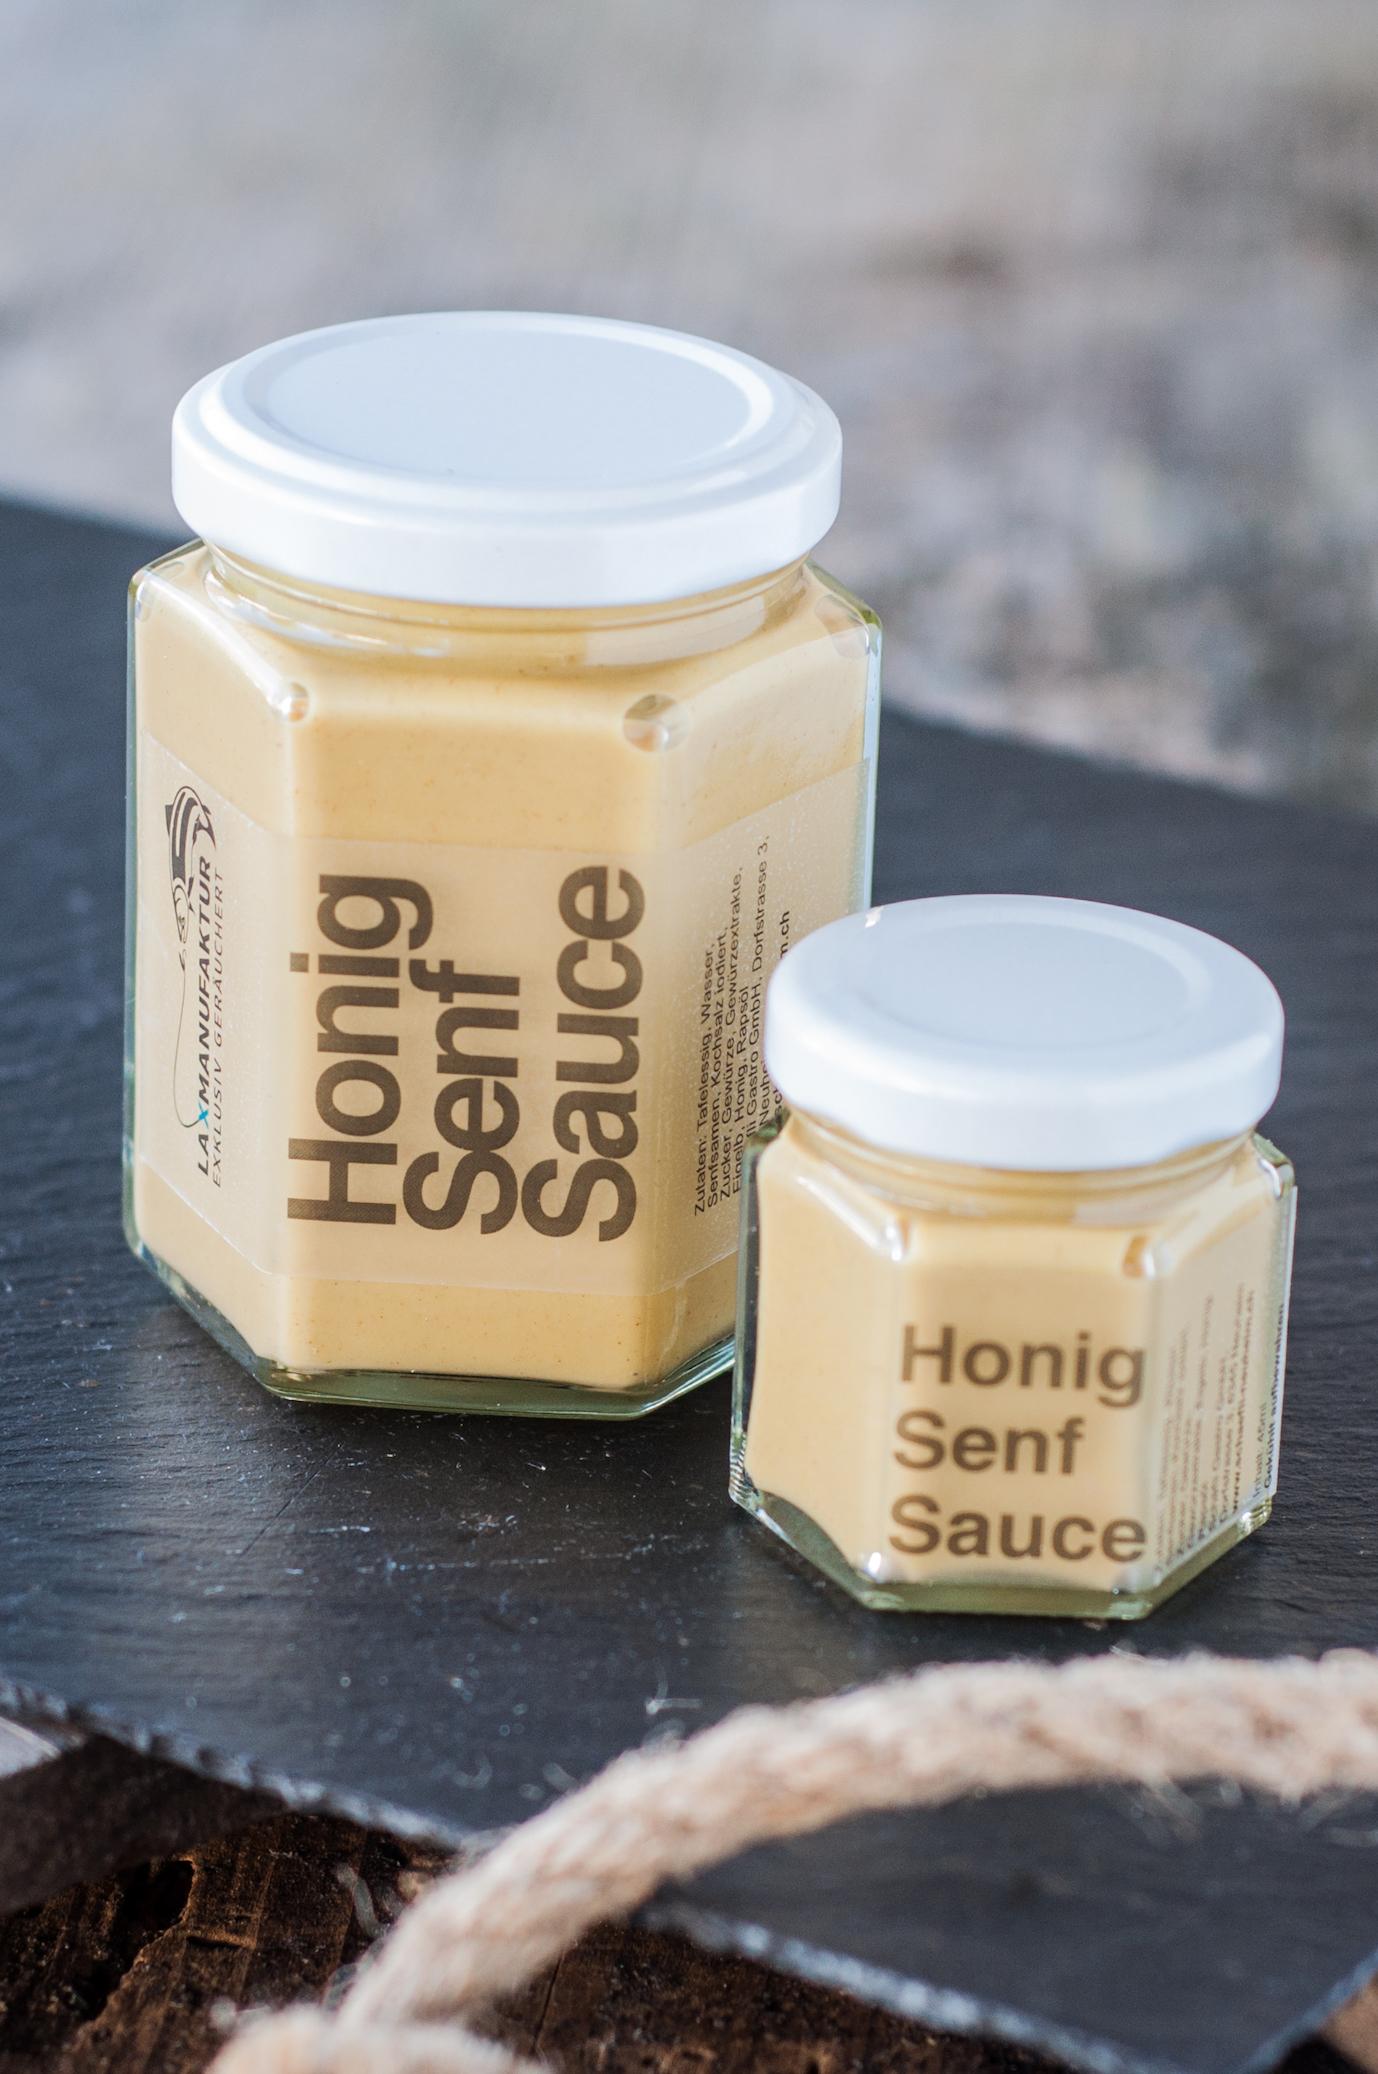 HonigSenf Sauce - 195ml